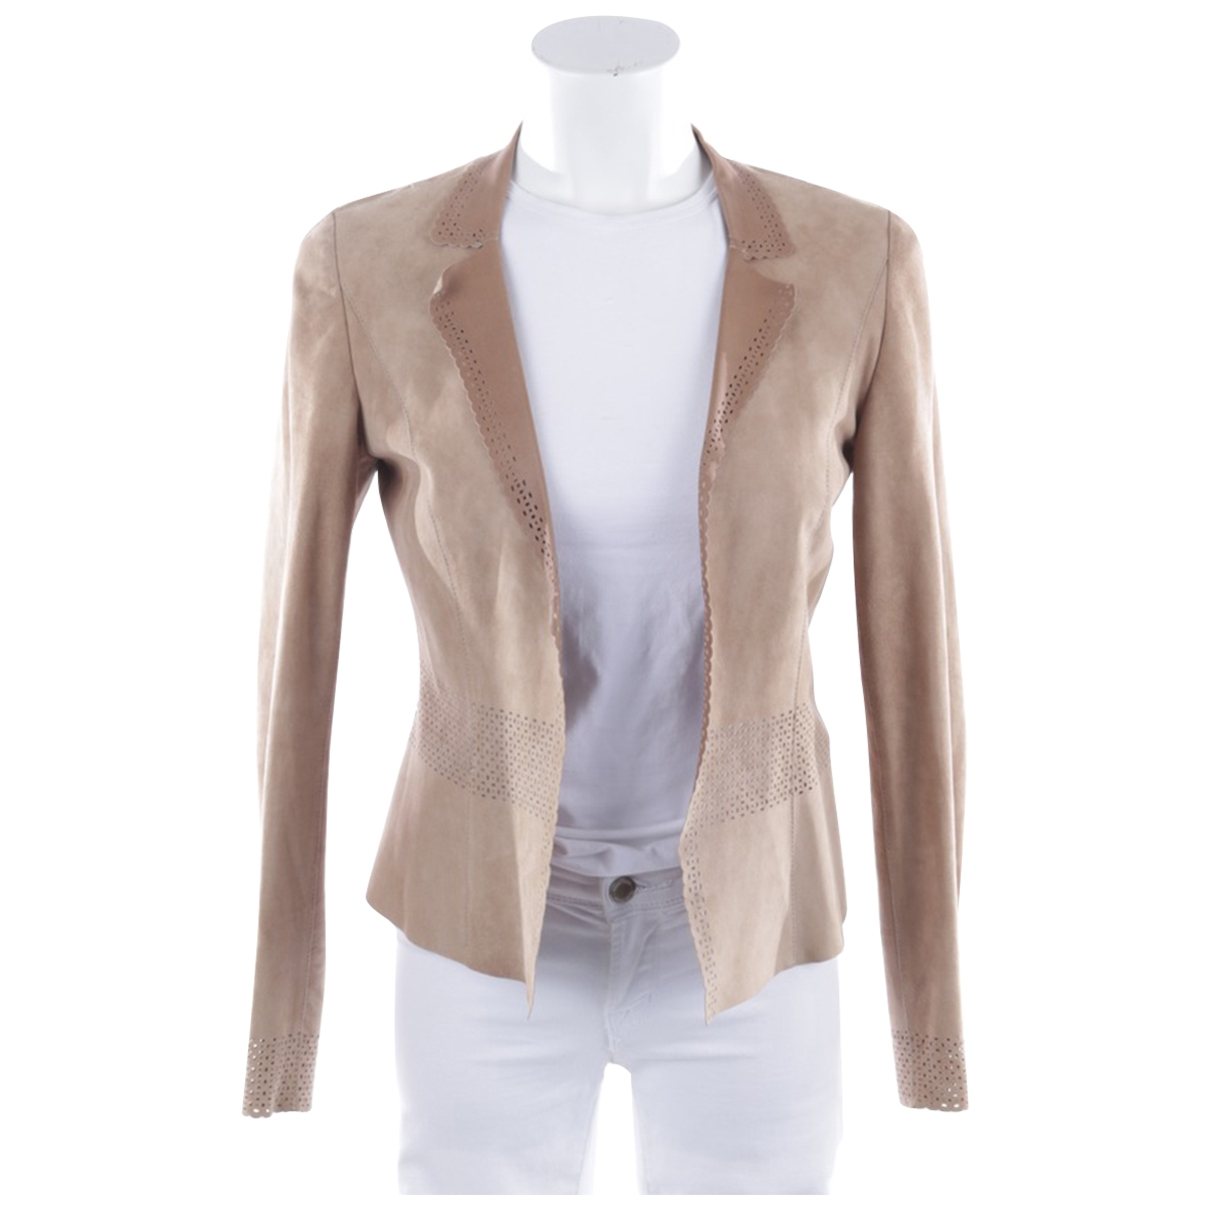 Marc Cain \N Beige Leather jacket for Women S International